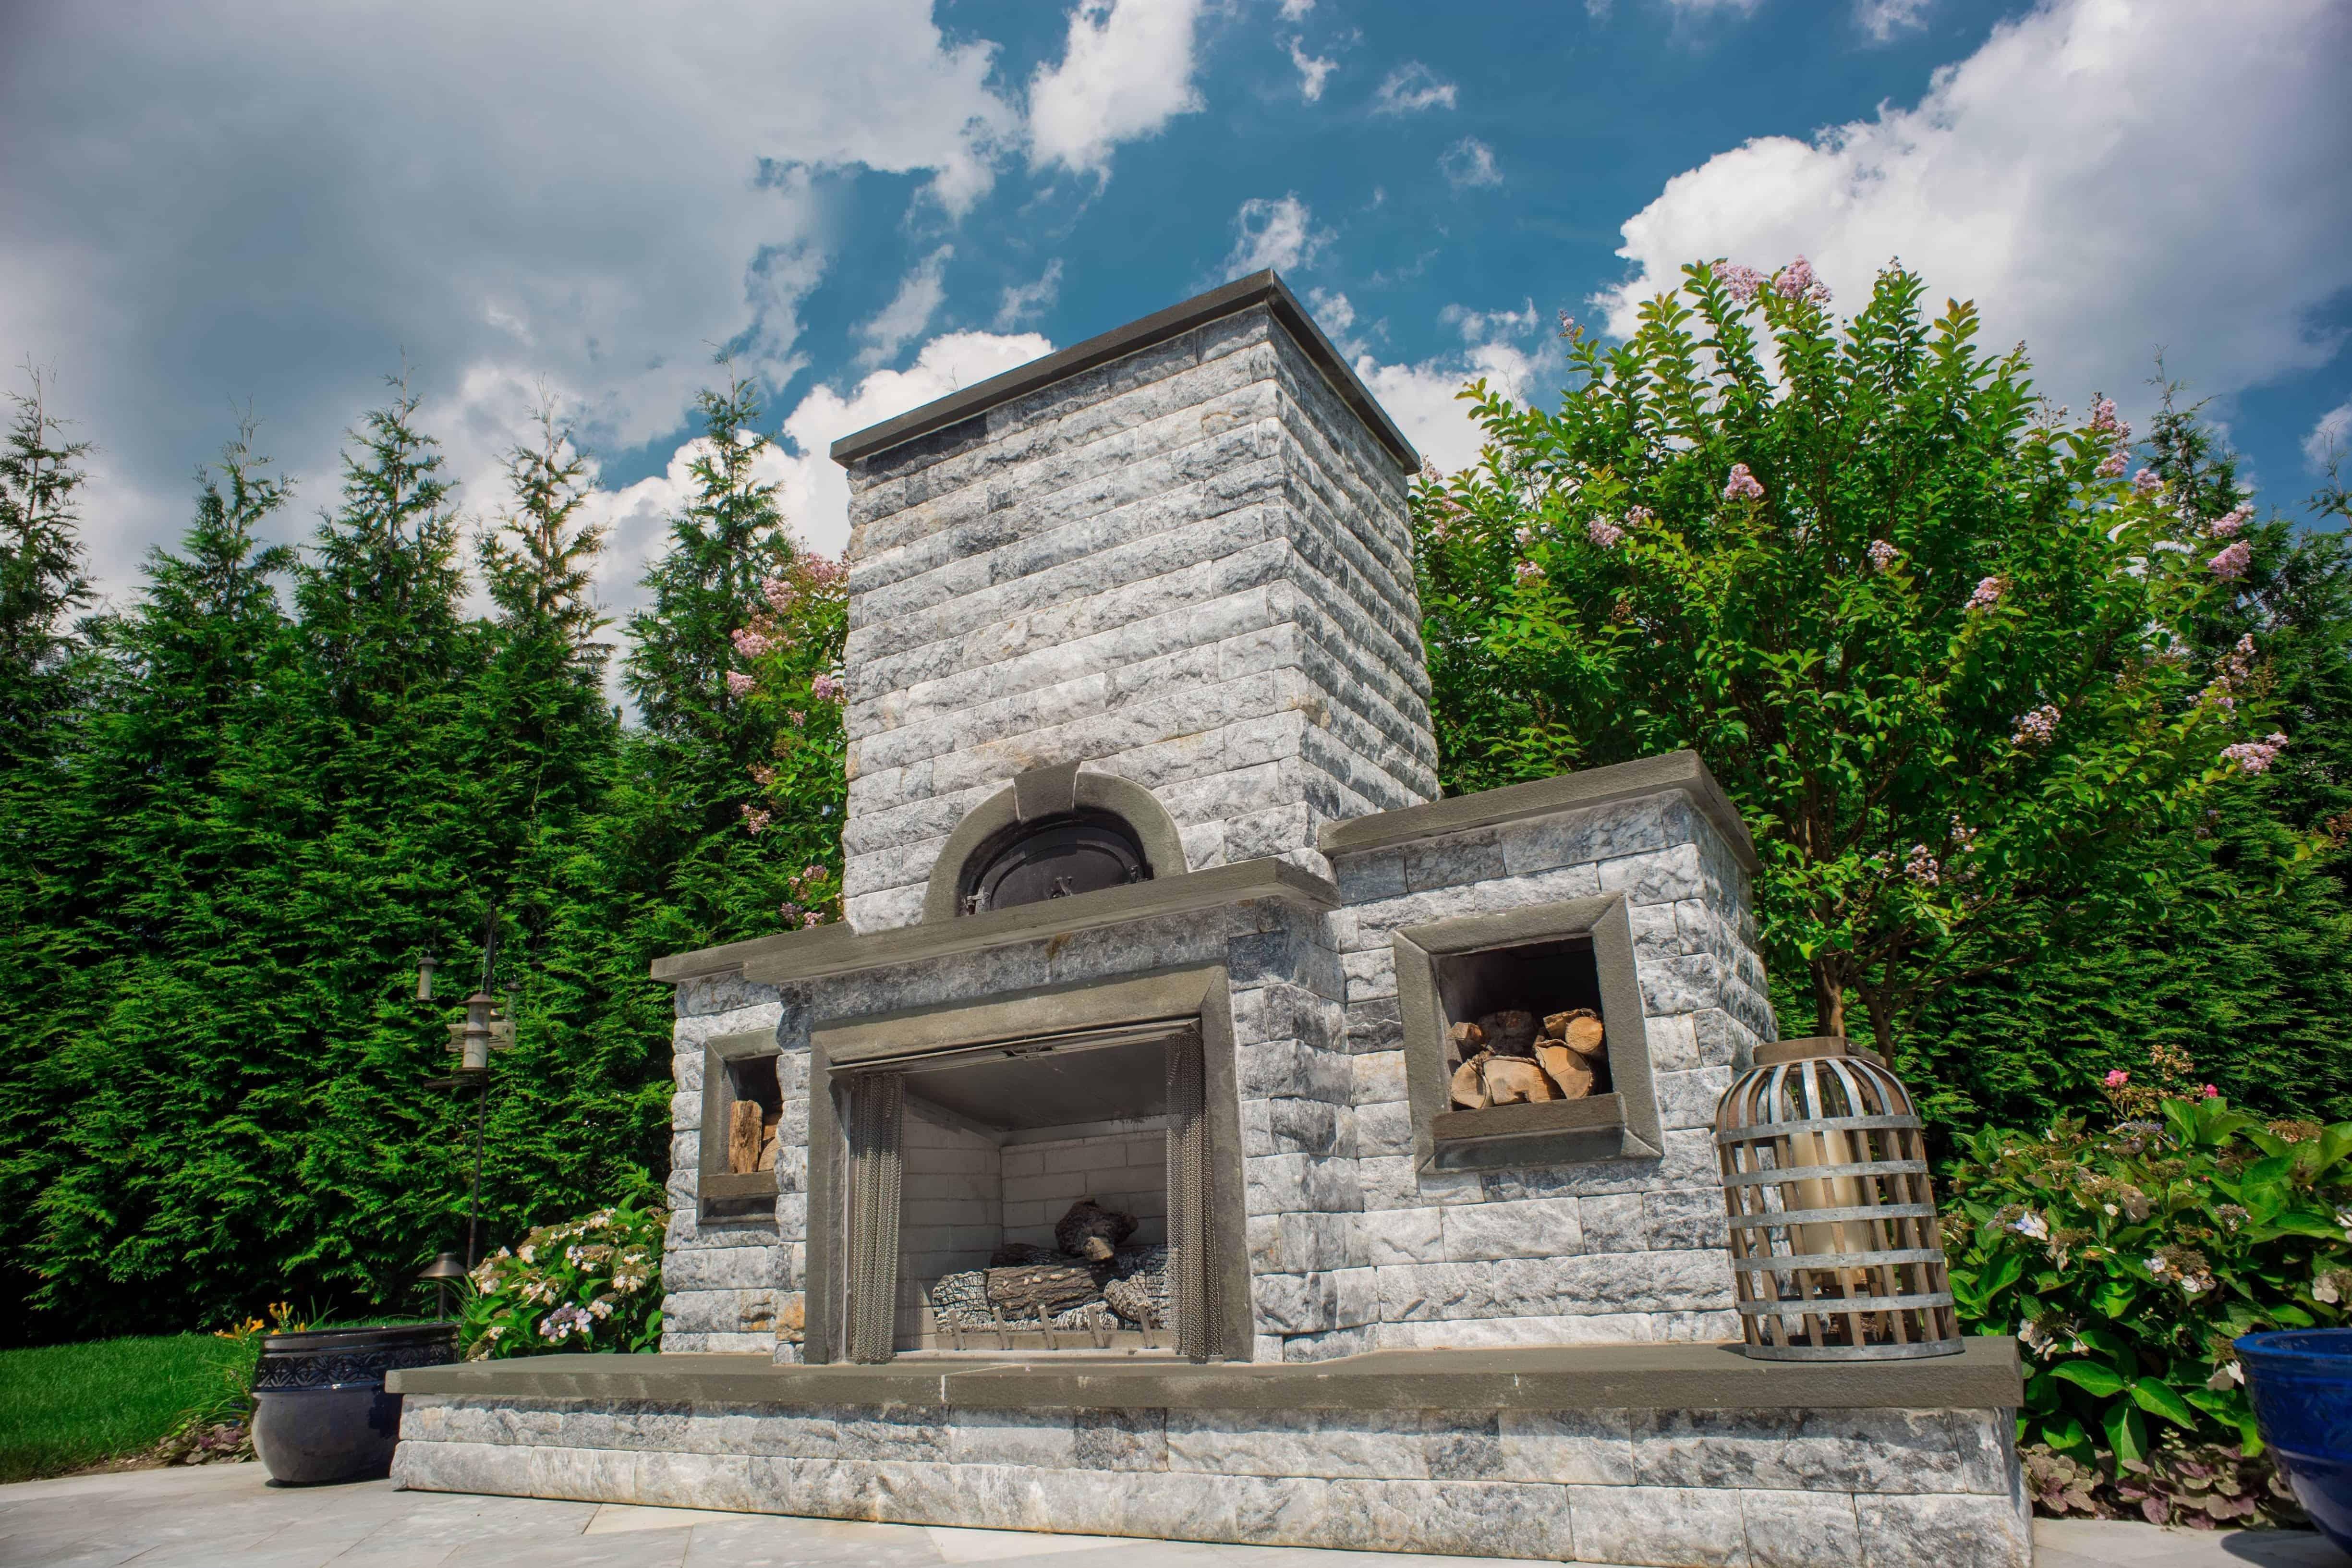 Grand Outdoor Fireplace with Pizza Oven - Marmiro Stone - Deep Blue - Plandome Manor, Long Island NY